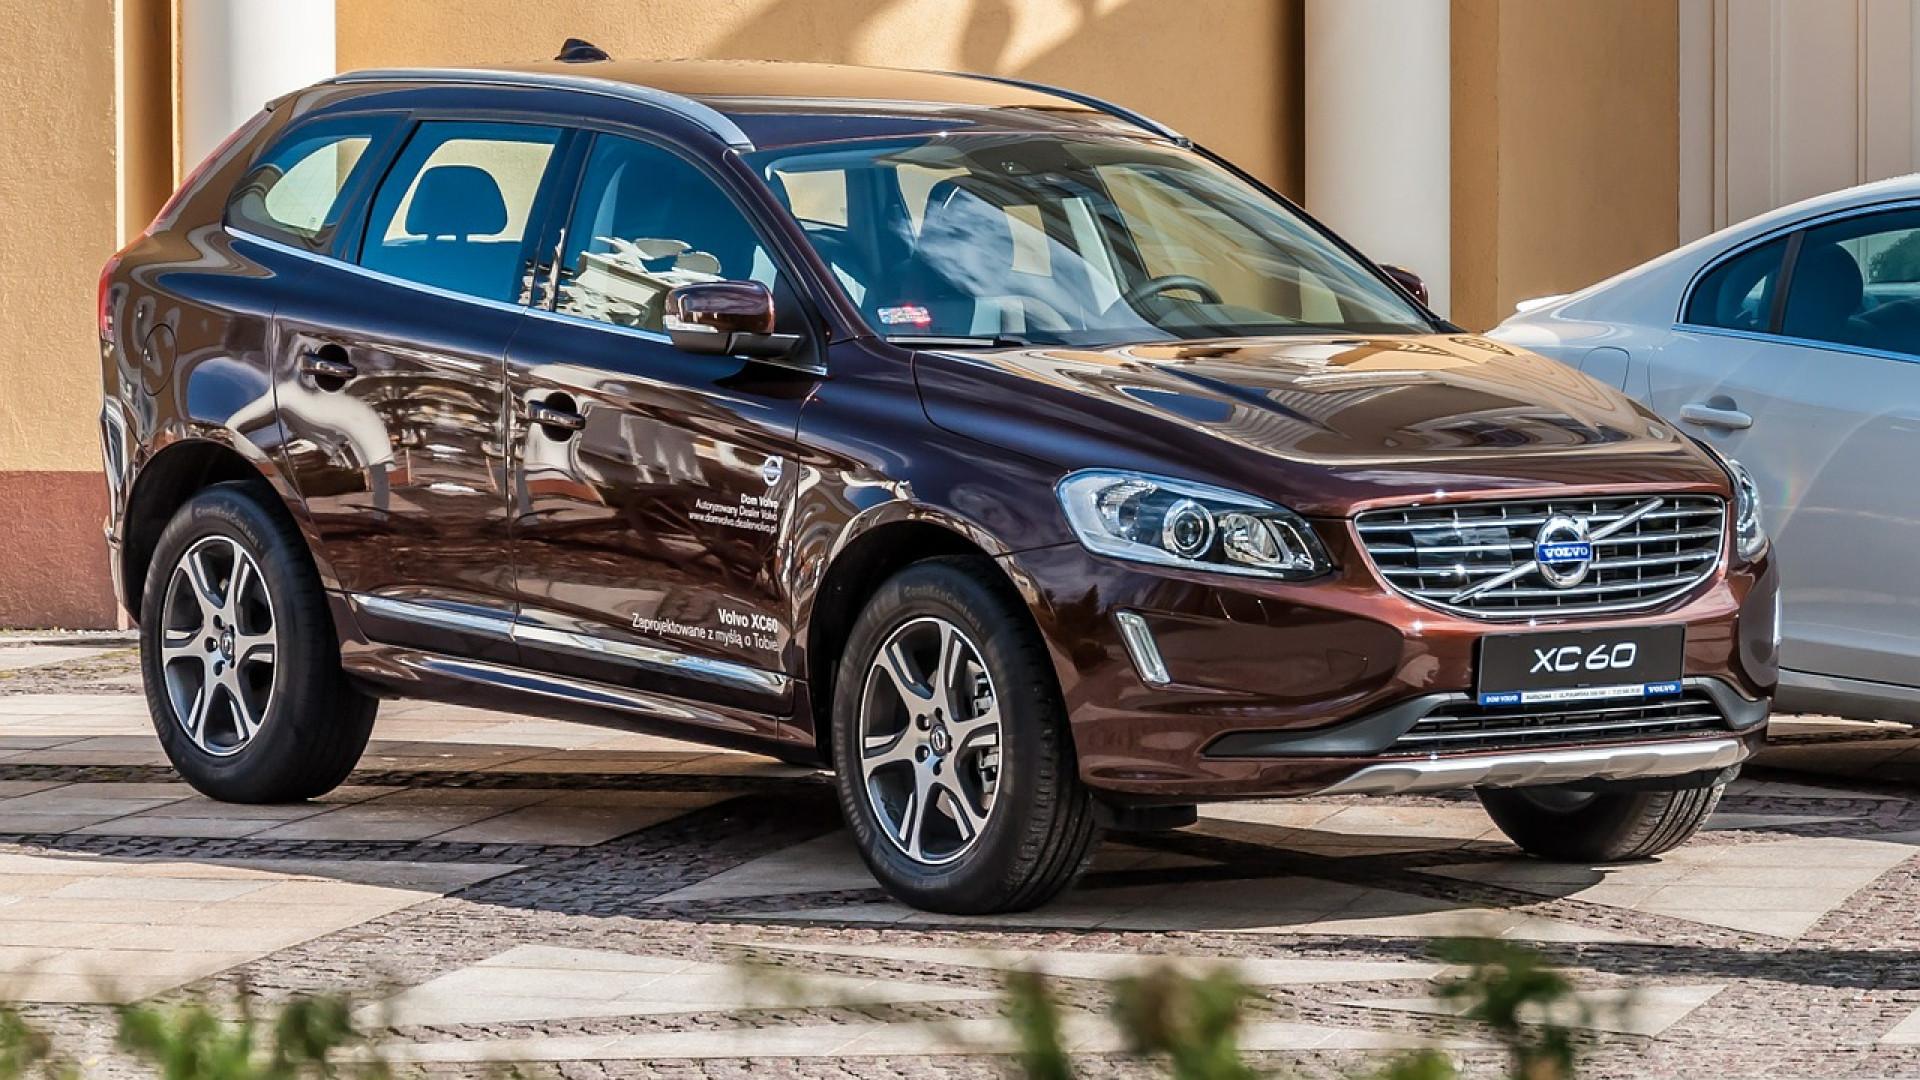 image Automobile : zoom sur la SUV Volvo XC60